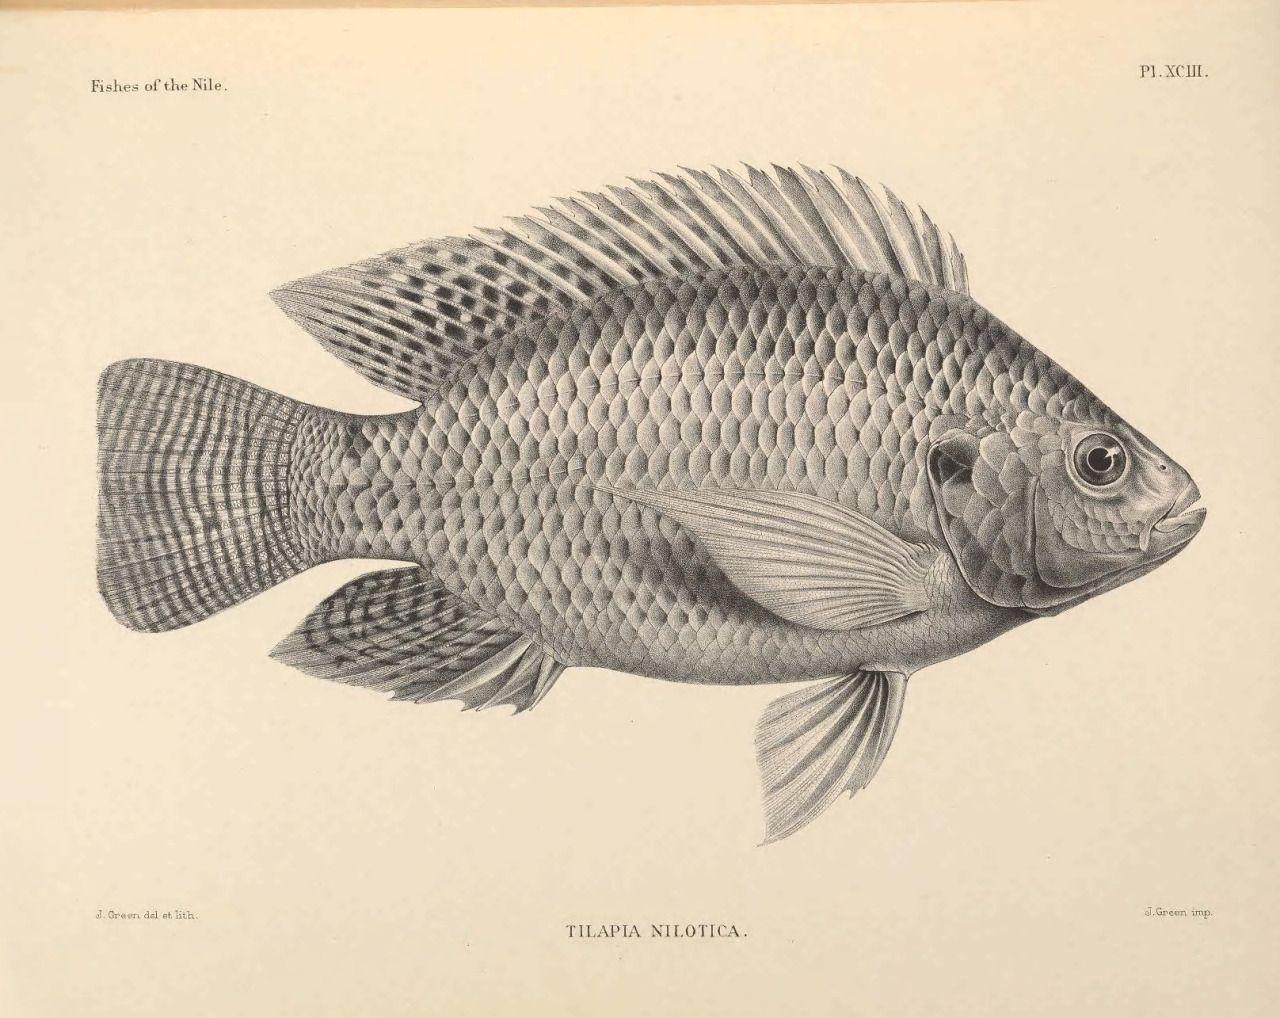 1280x1018 Scientific Illustration The Nile Tilapia, Oreochromis Niloticus